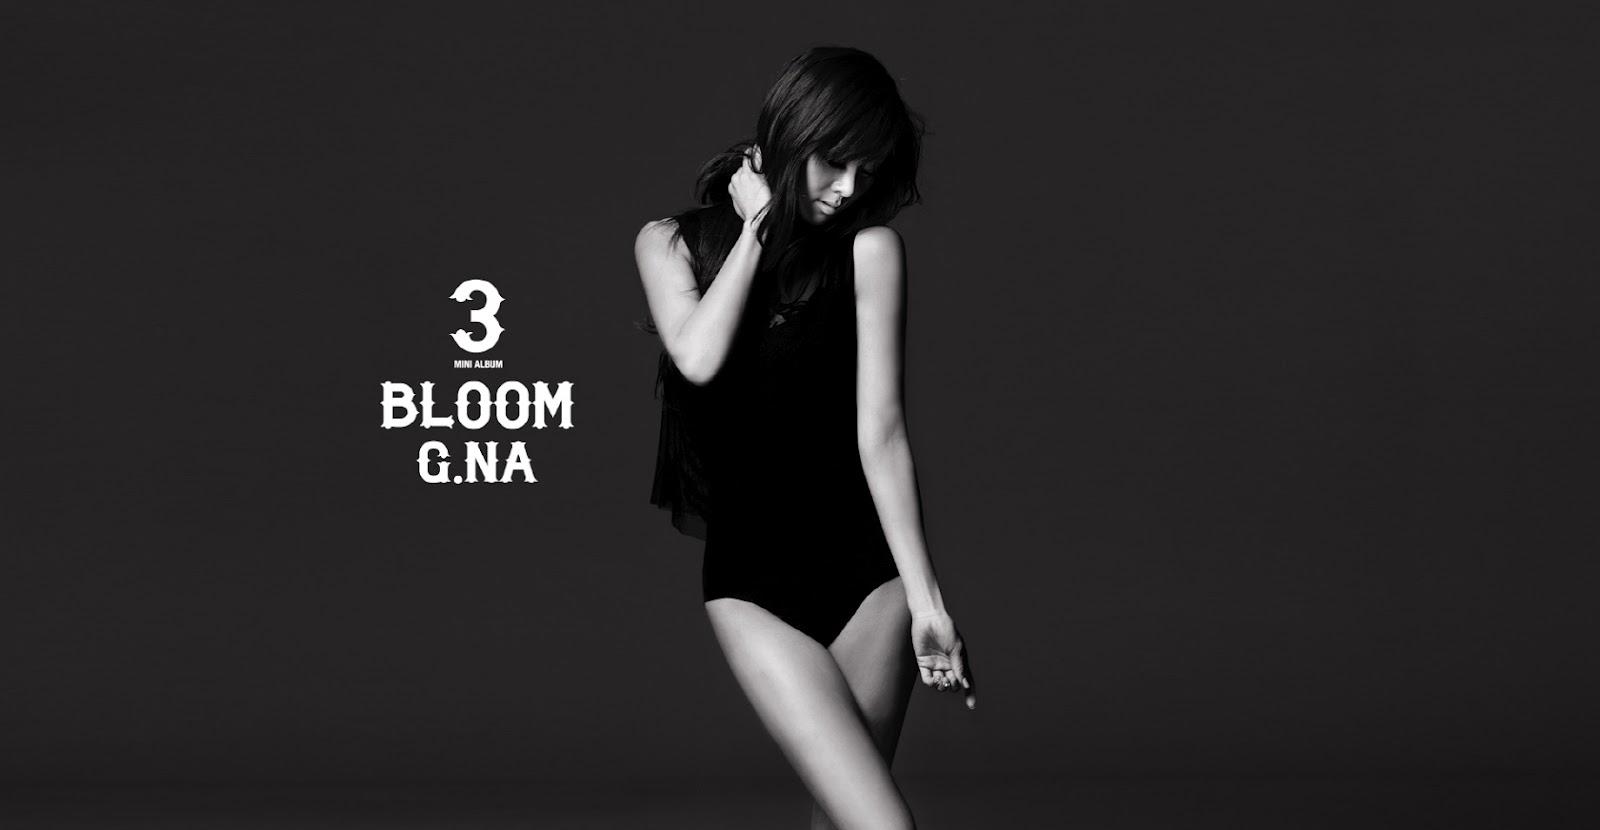 http://3.bp.blogspot.com/-Q3n1NLX6n0c/UR4t11hJt8I/AAAAAAAAcaw/aNEInMkGJN4/s1600/G.NA+Bloom+2HOT+Wallpaper.jpg